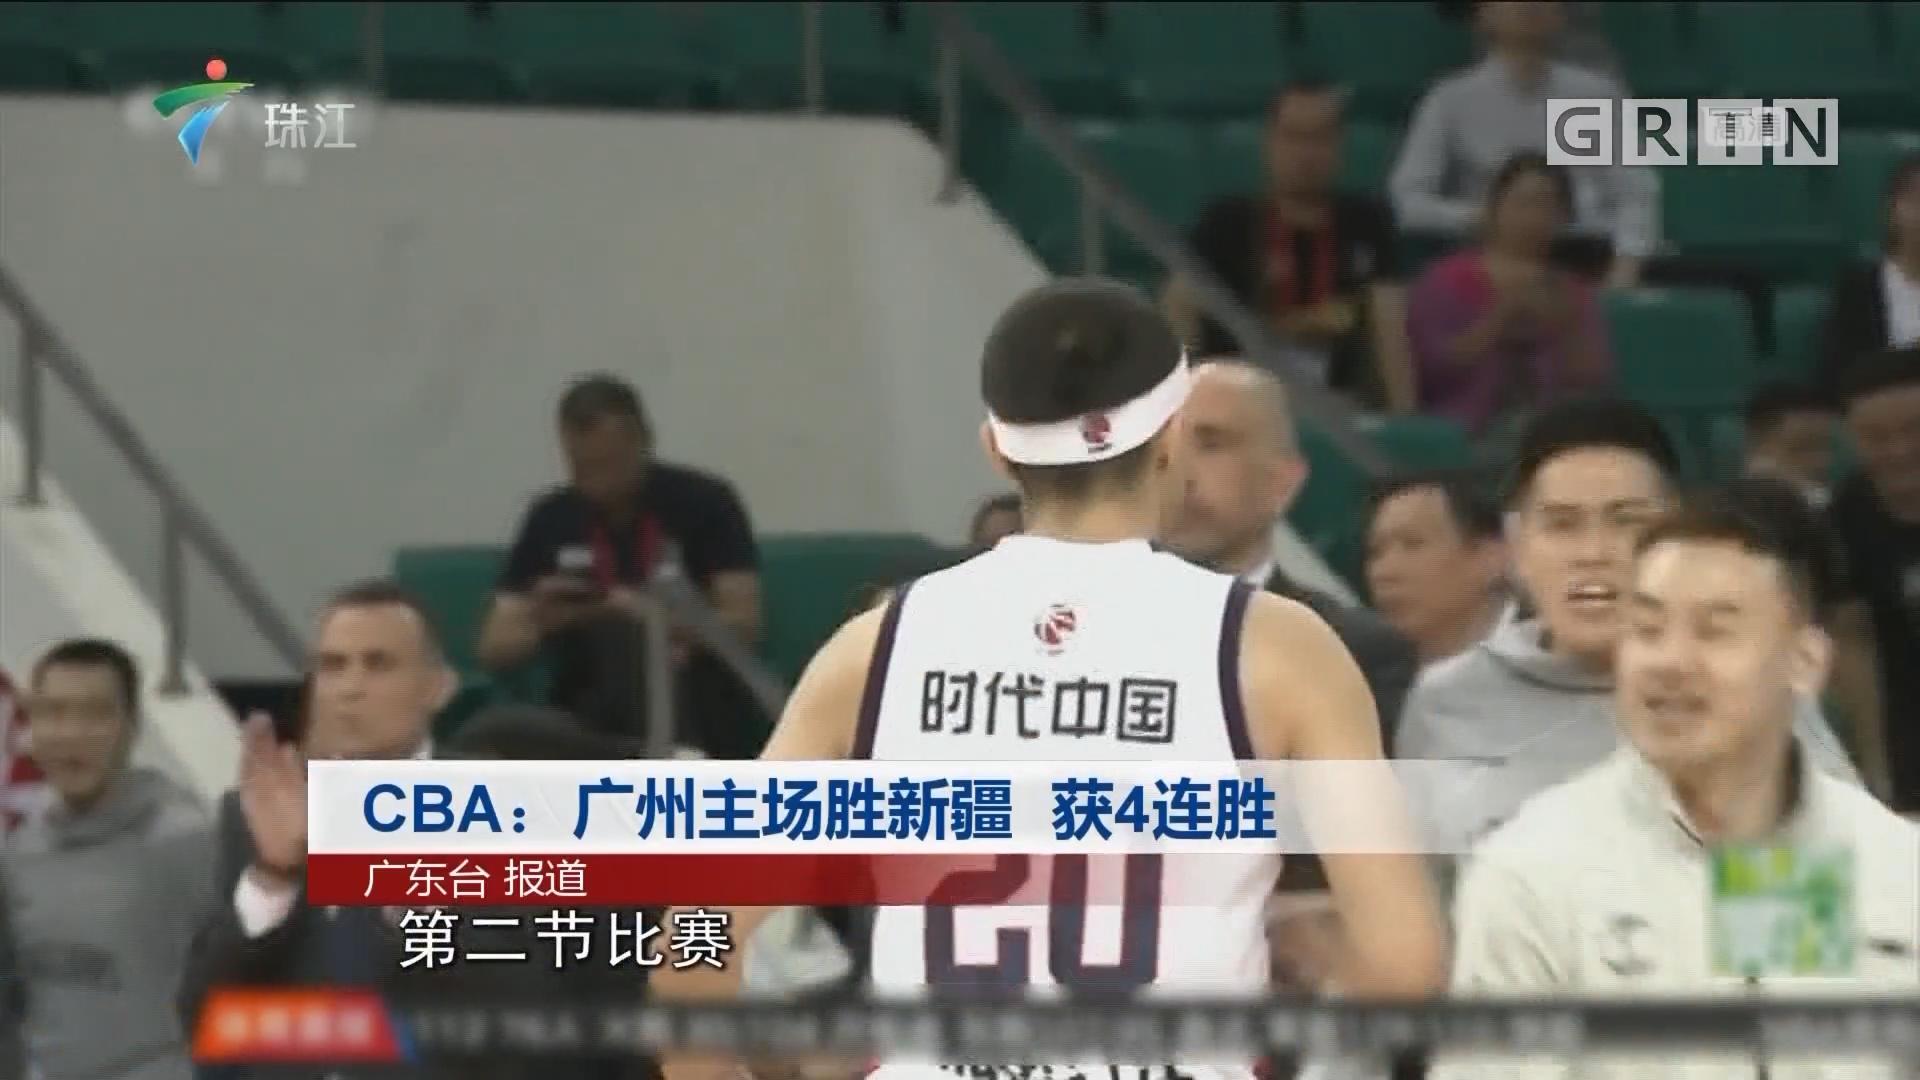 CBA:广州主场胜新疆 获4连胜